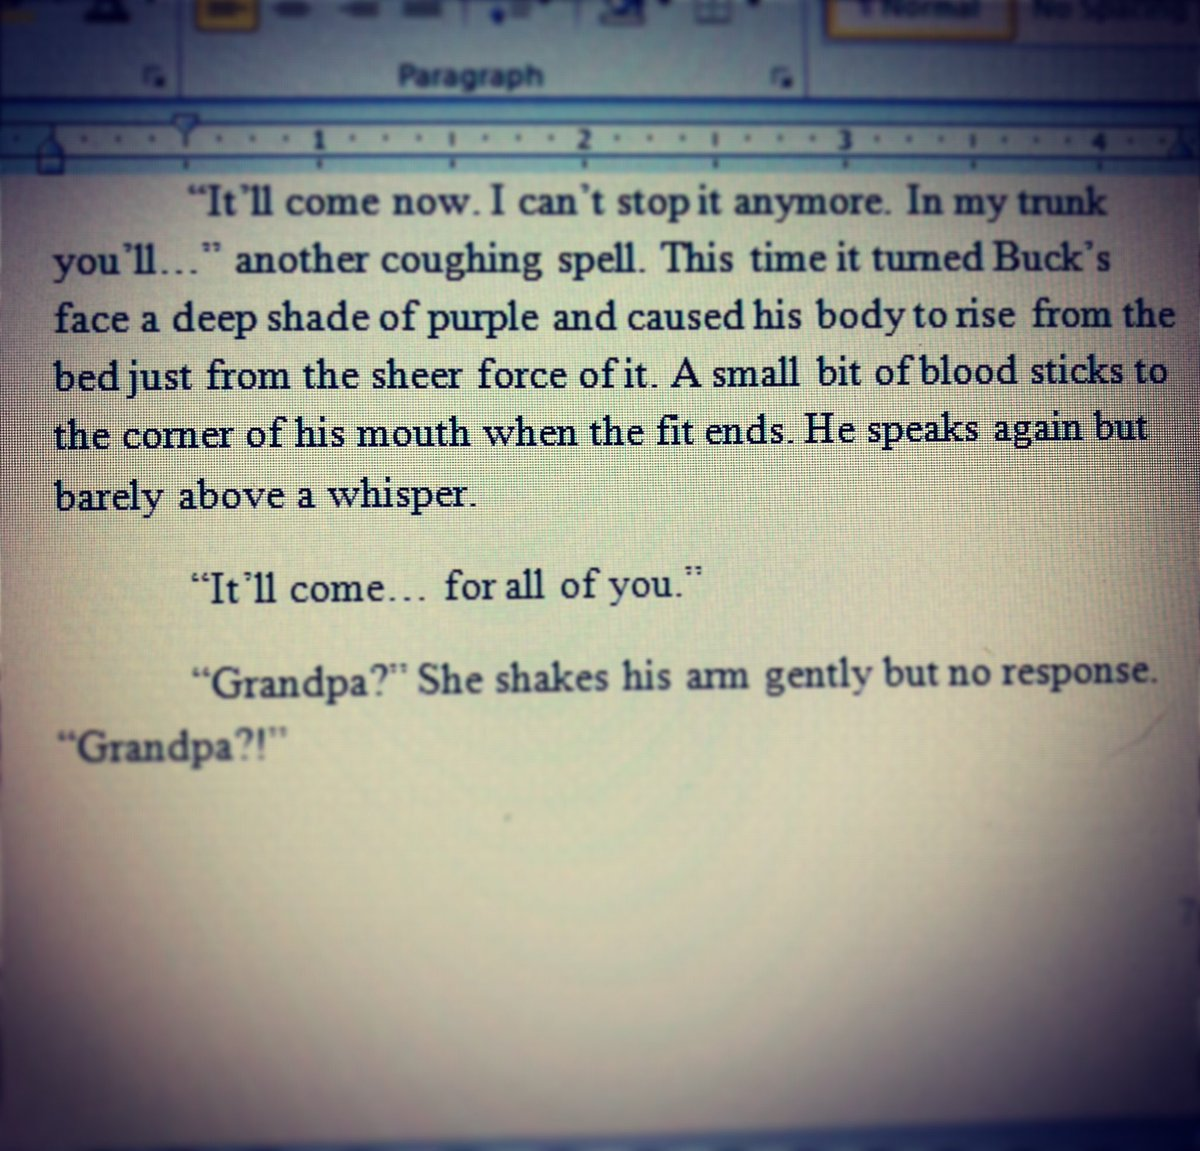 RT @AuthorImberBlu: Currently... #amwriting #newbook #Sneakpeek #itgetsworse #authorconfession https://t.co/qklOaahXHe